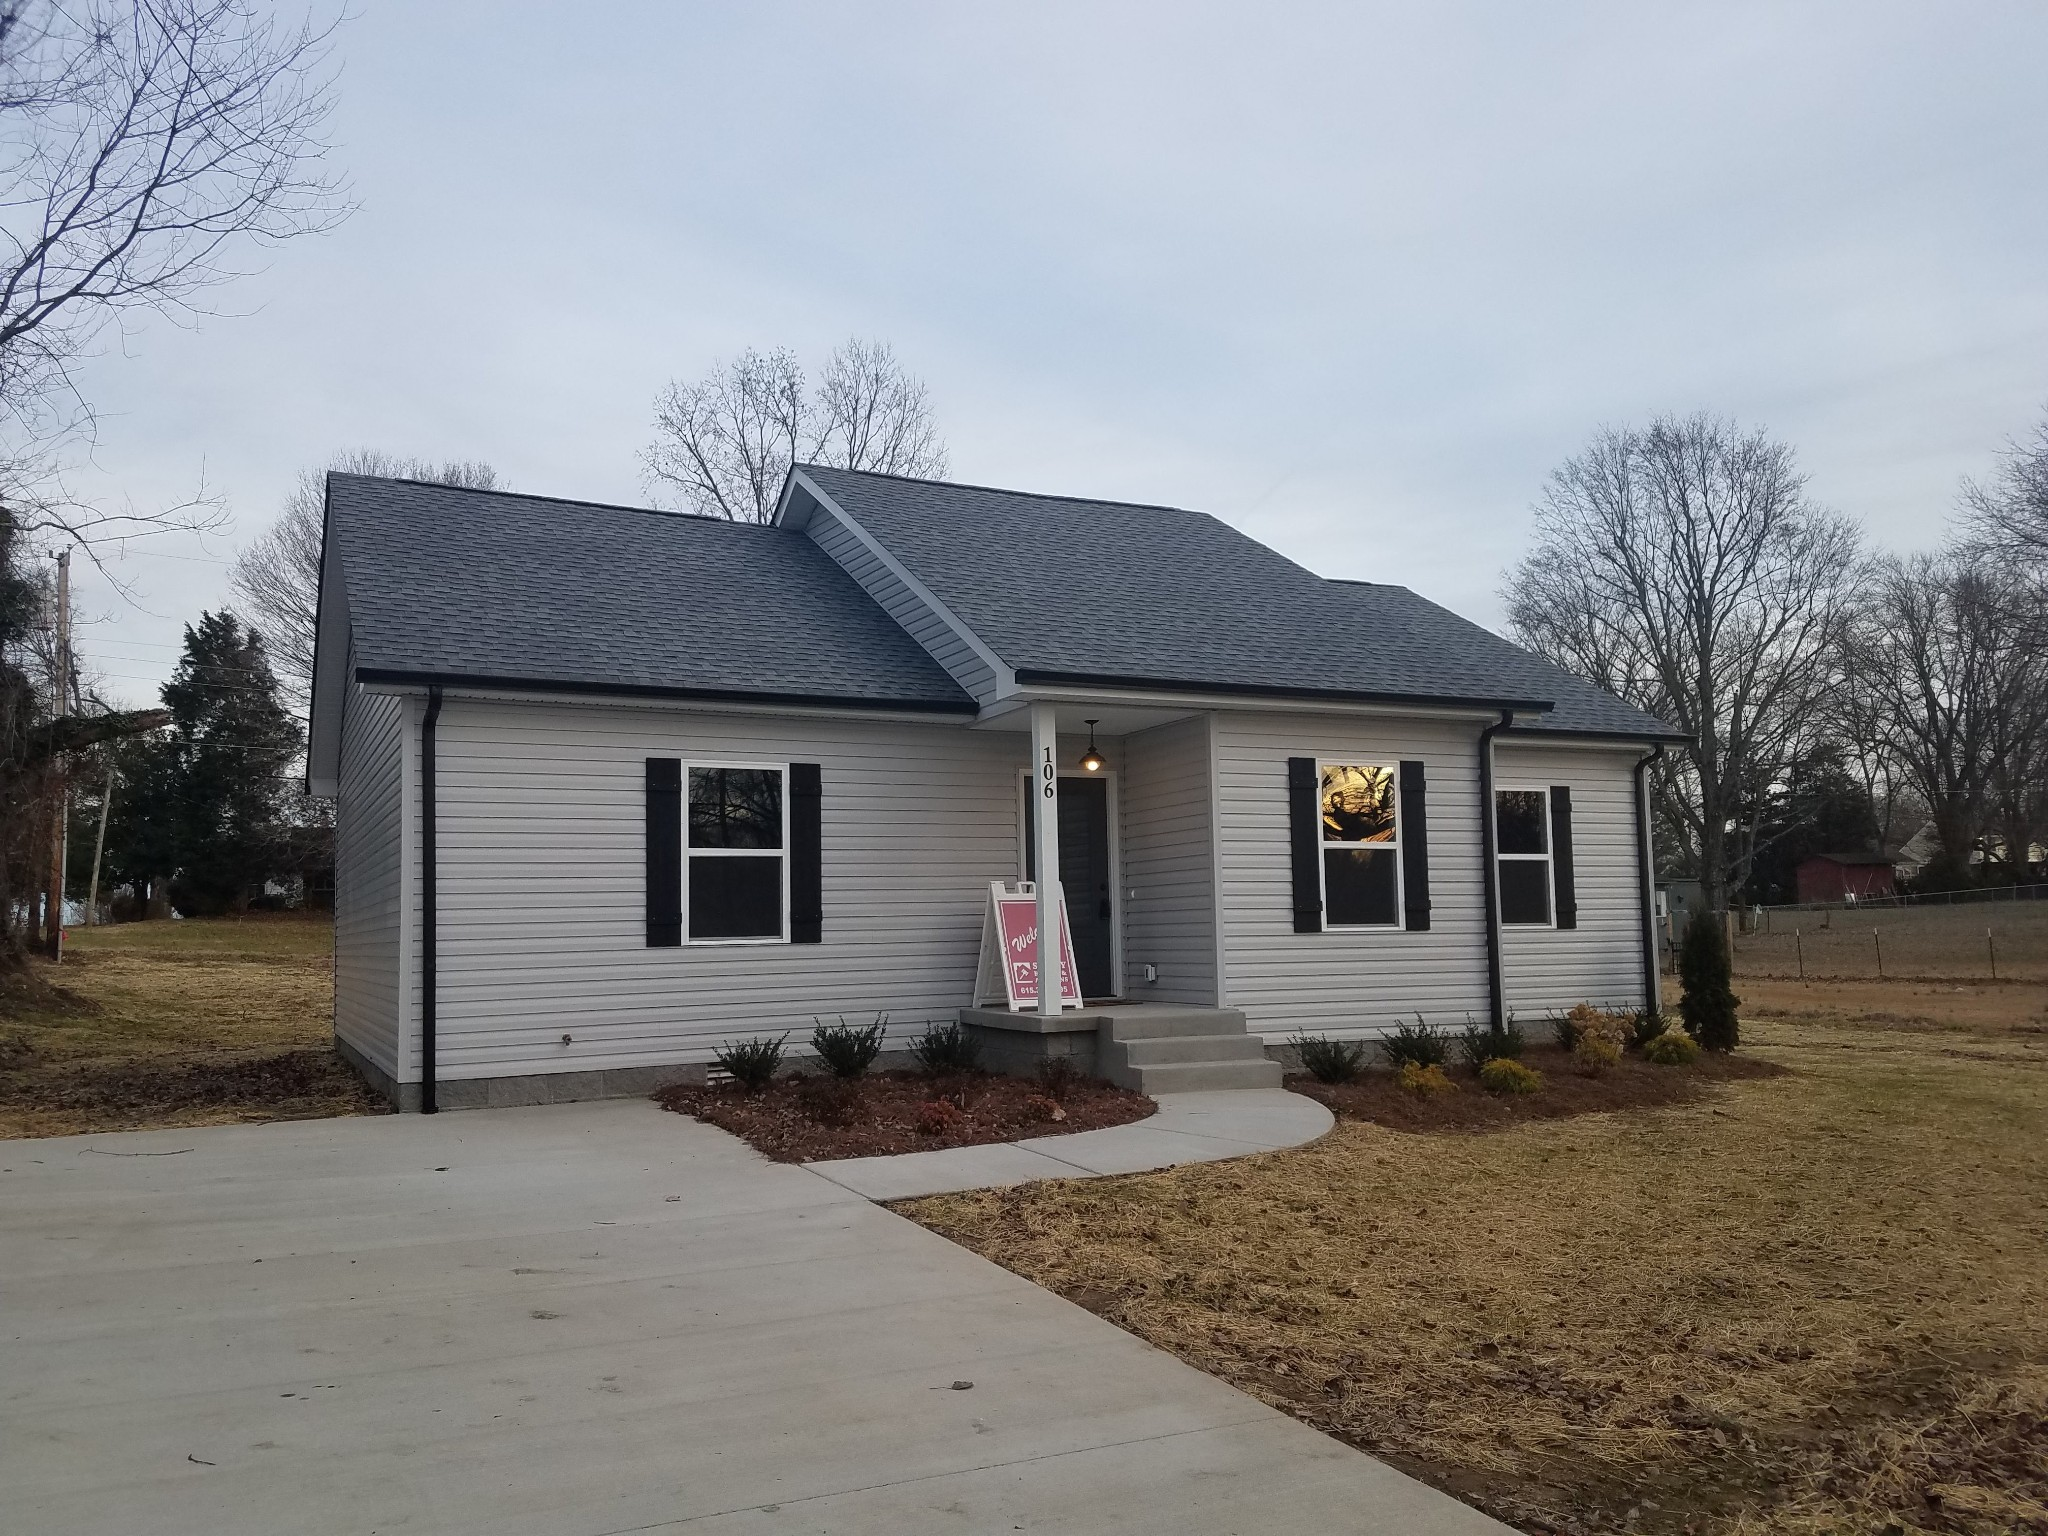 106 Rudolph St, Springfield, TN 37172 - Springfield, TN real estate listing